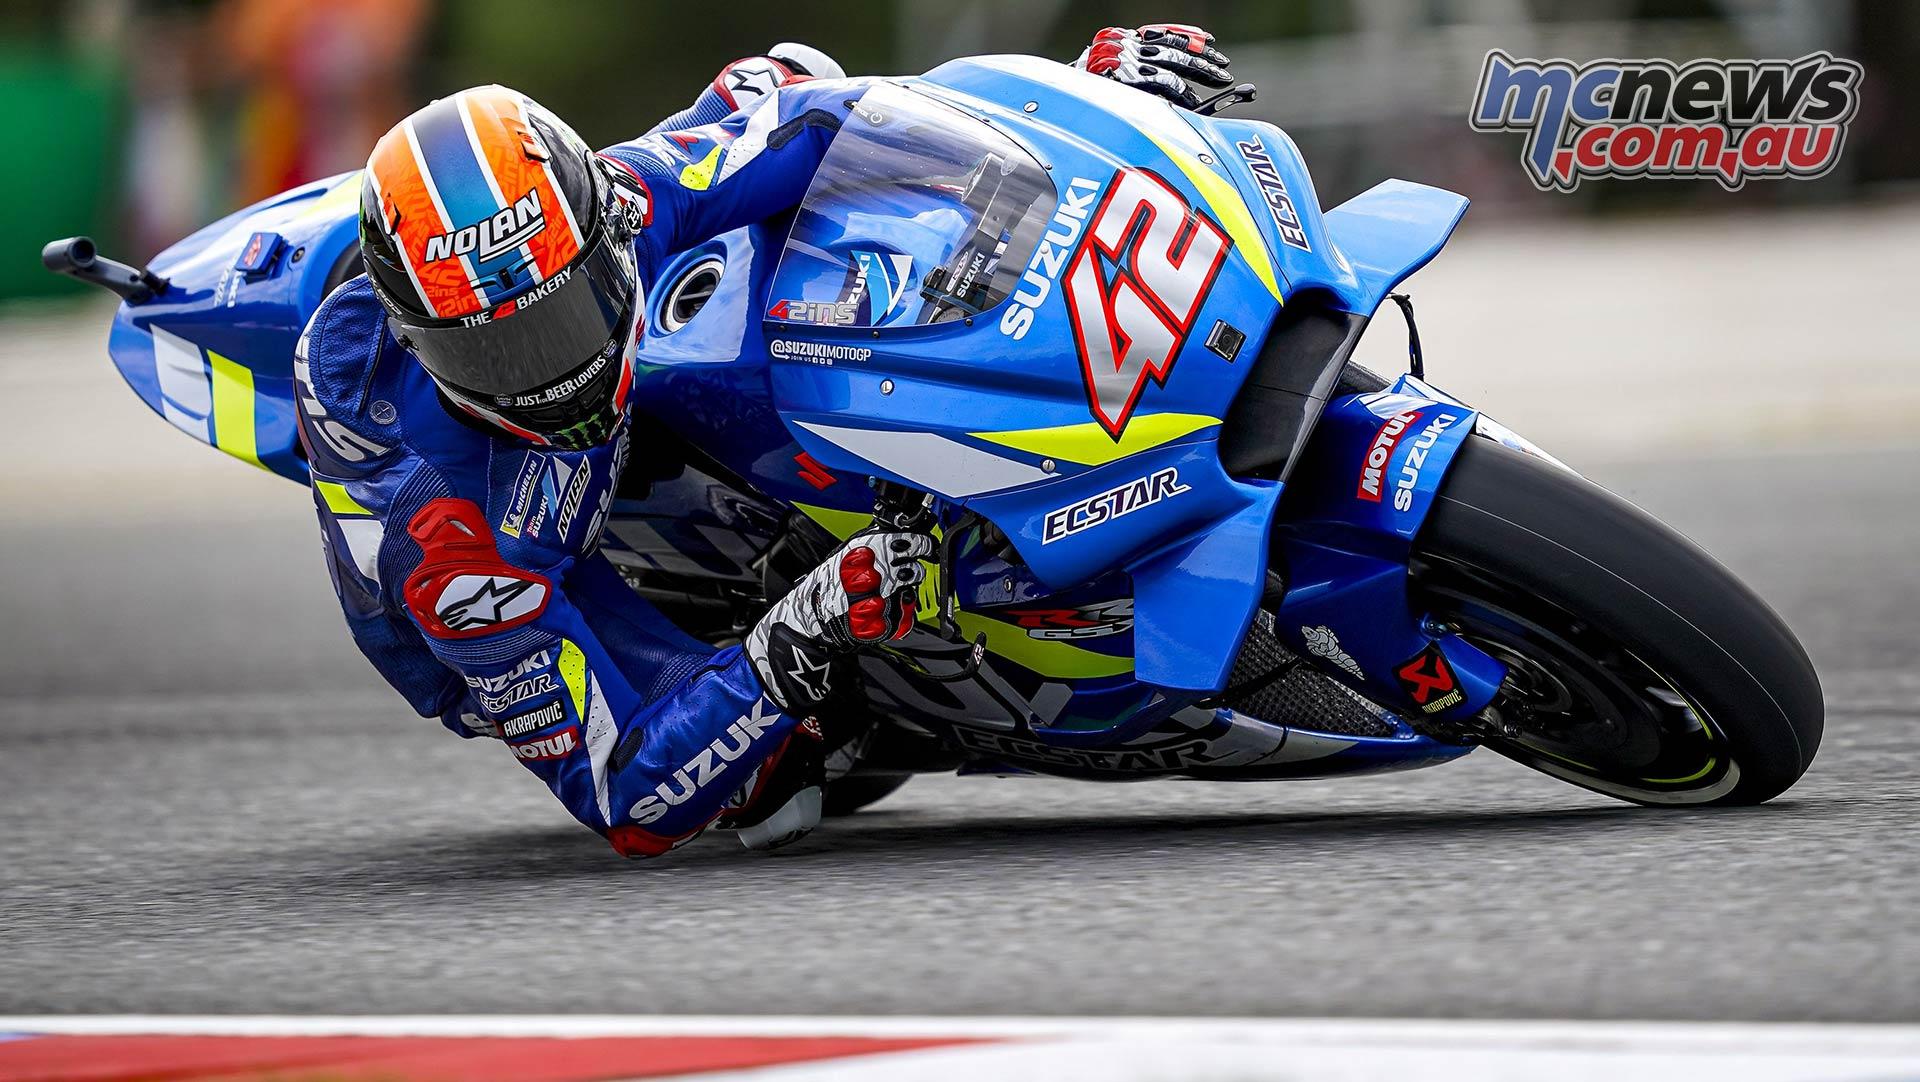 MotoGP Round Brno Fri Rins